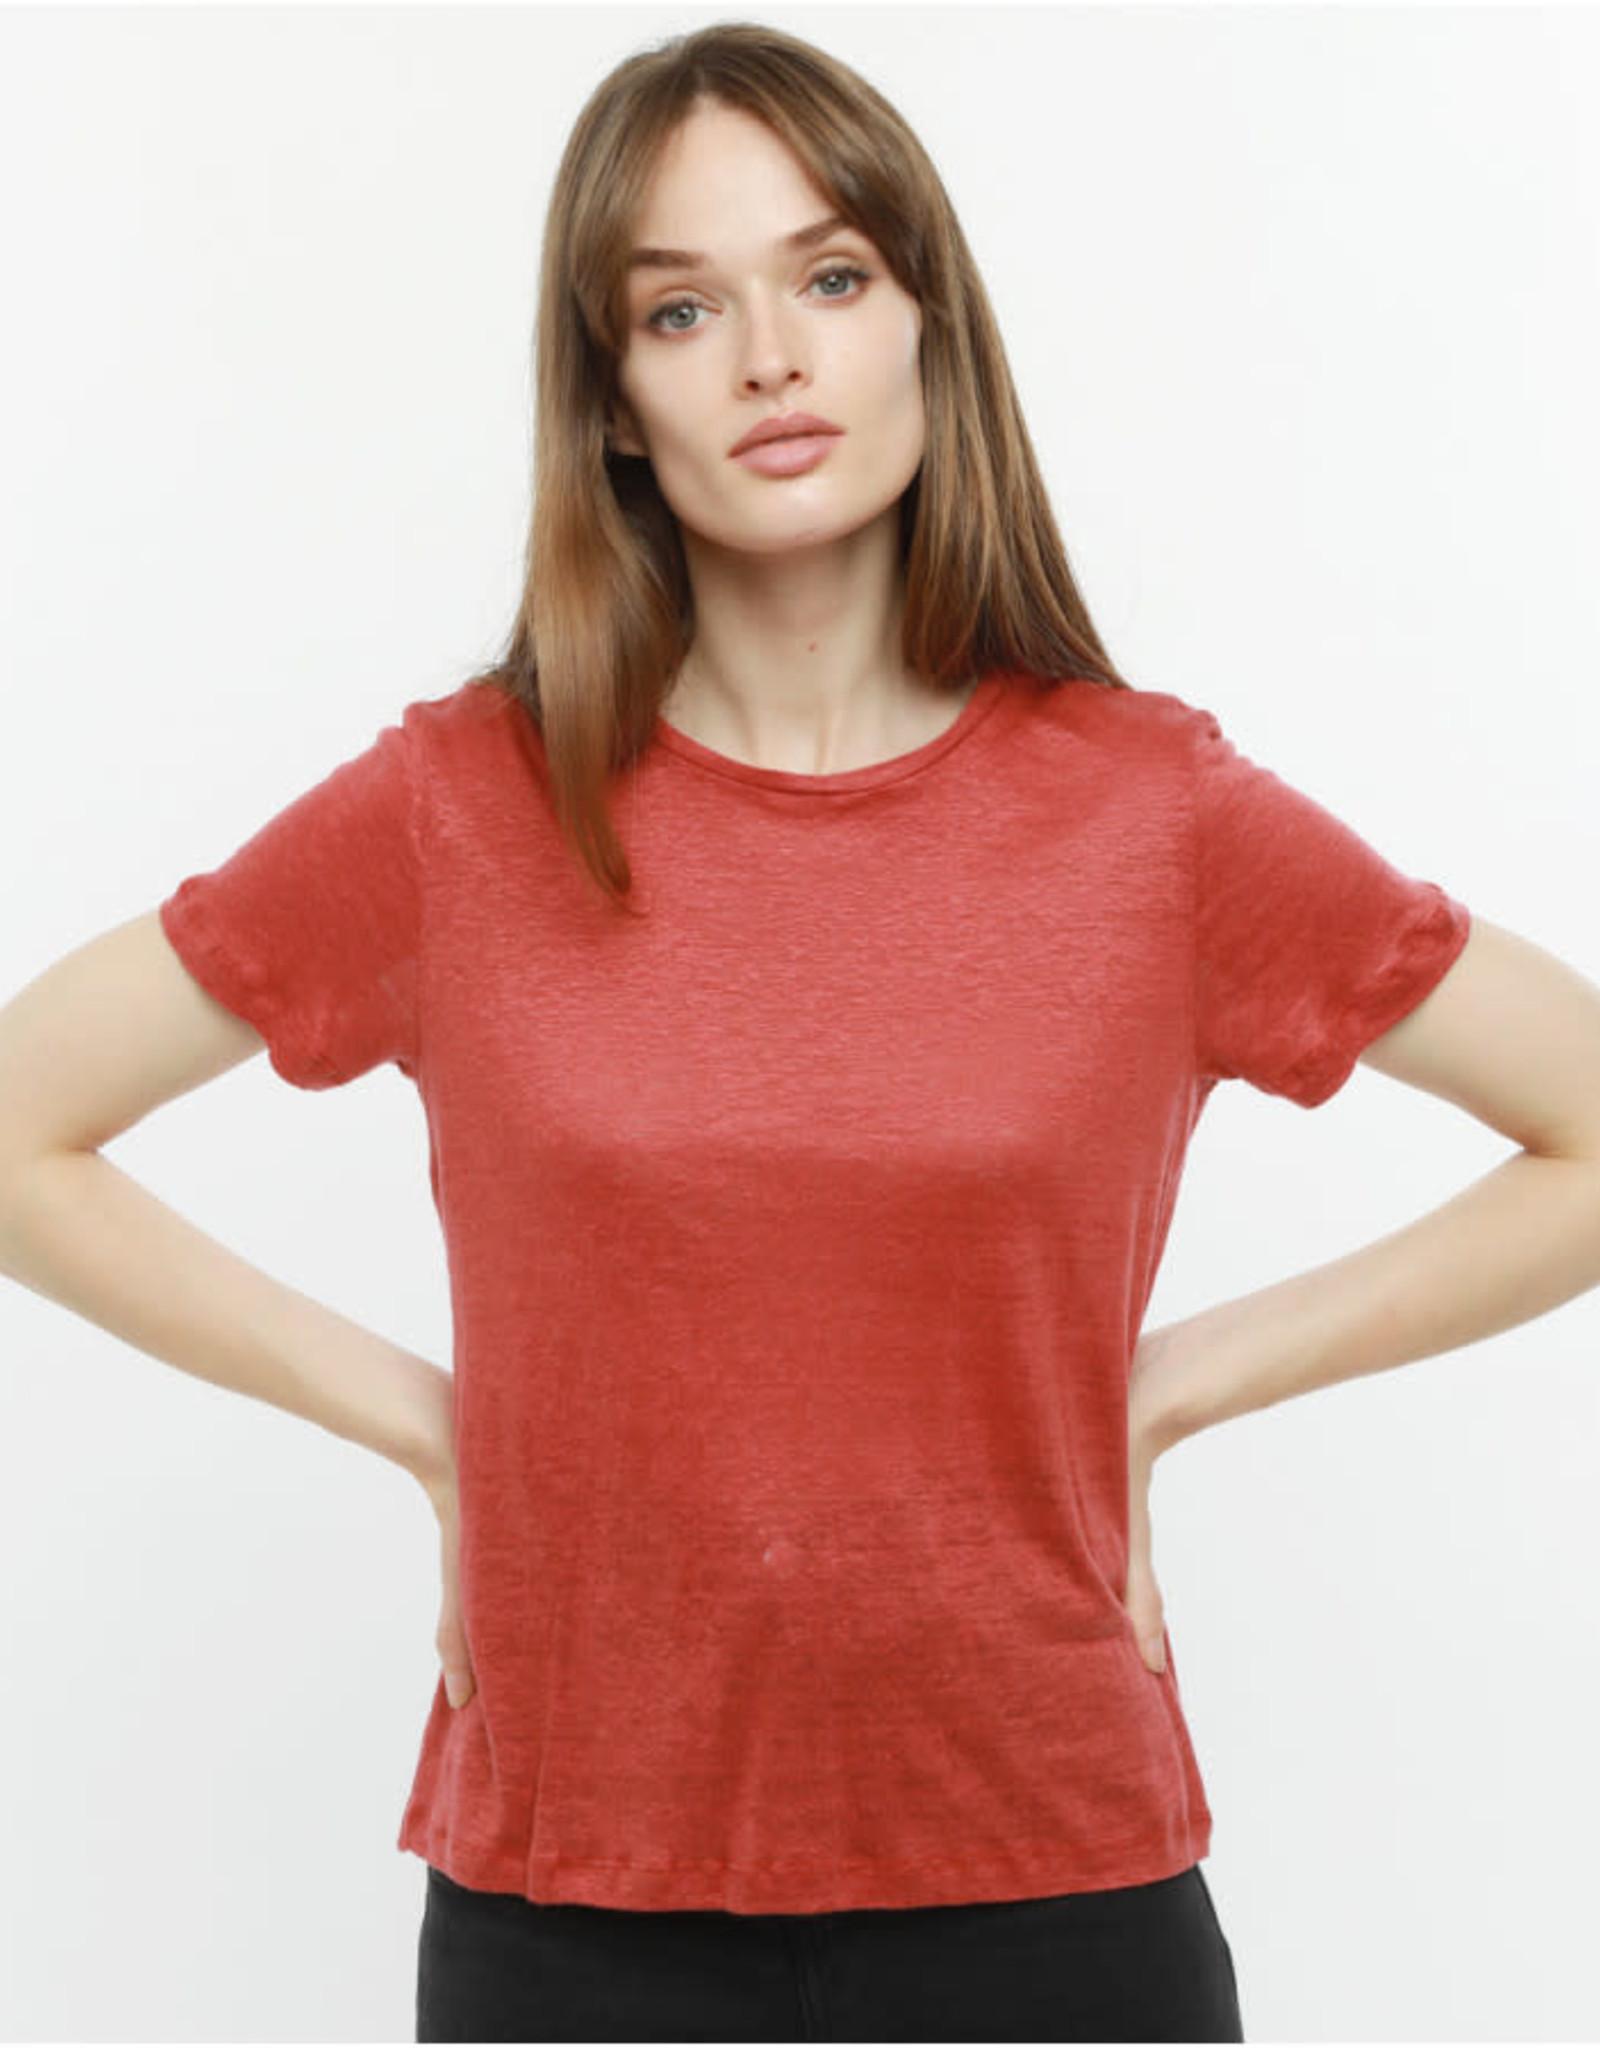 The Golden House T-Shirt 'Melody' - Rust